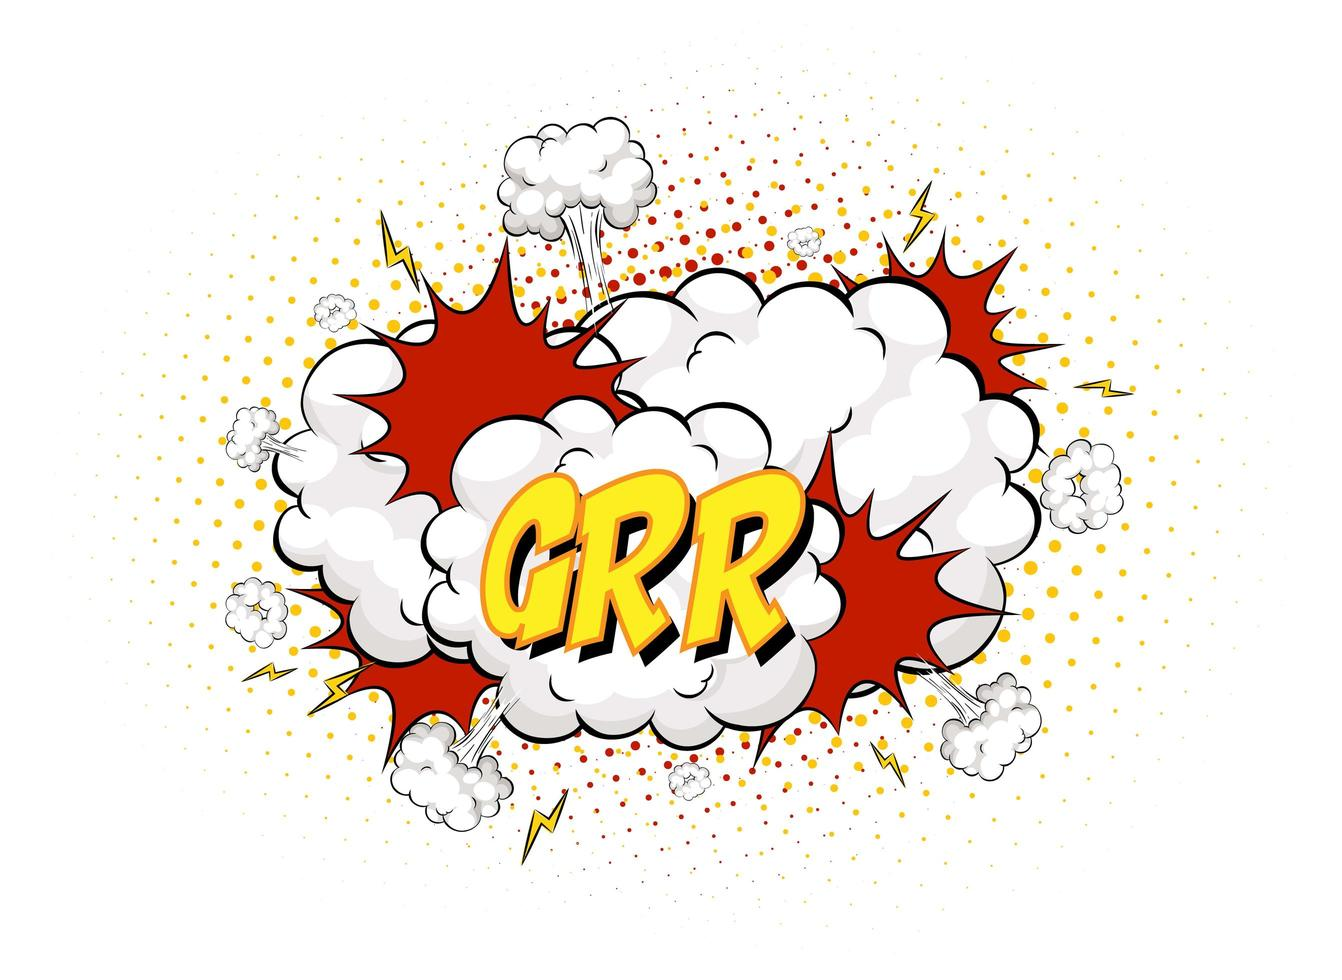 Grr texto en explosión de nube cómica aislado sobre fondo blanco. vector